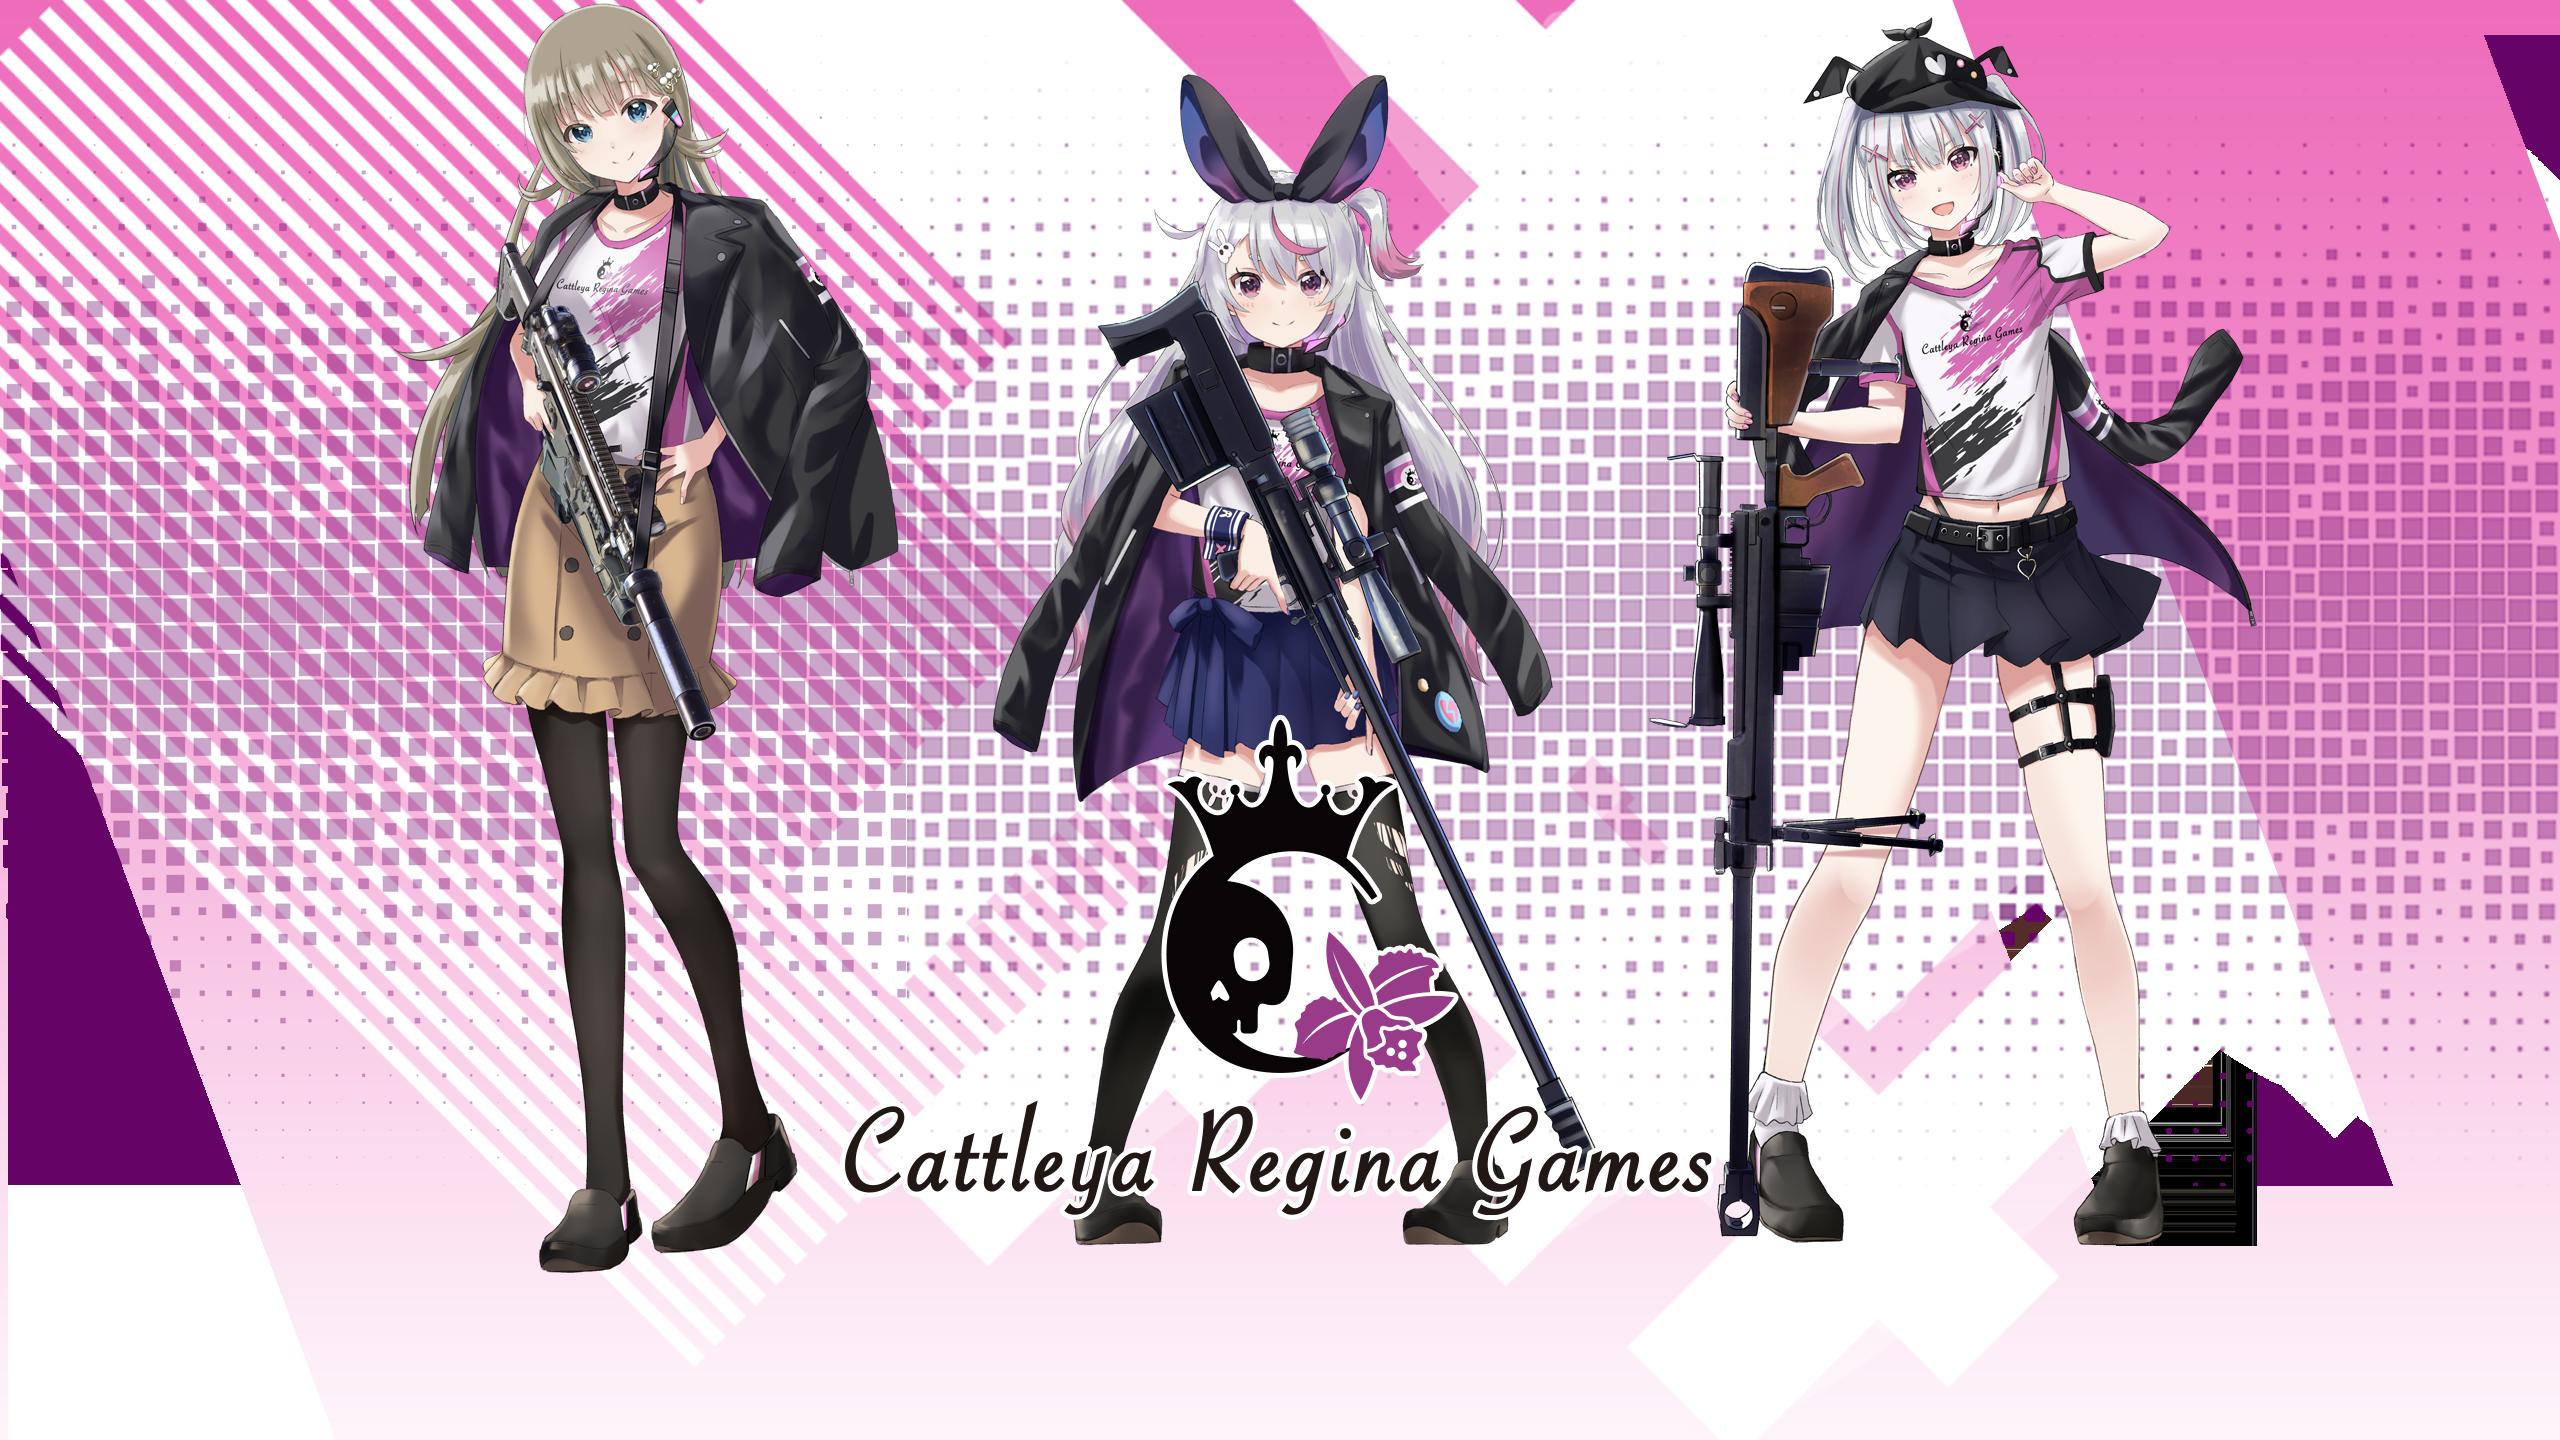 Cattleya Regina Games